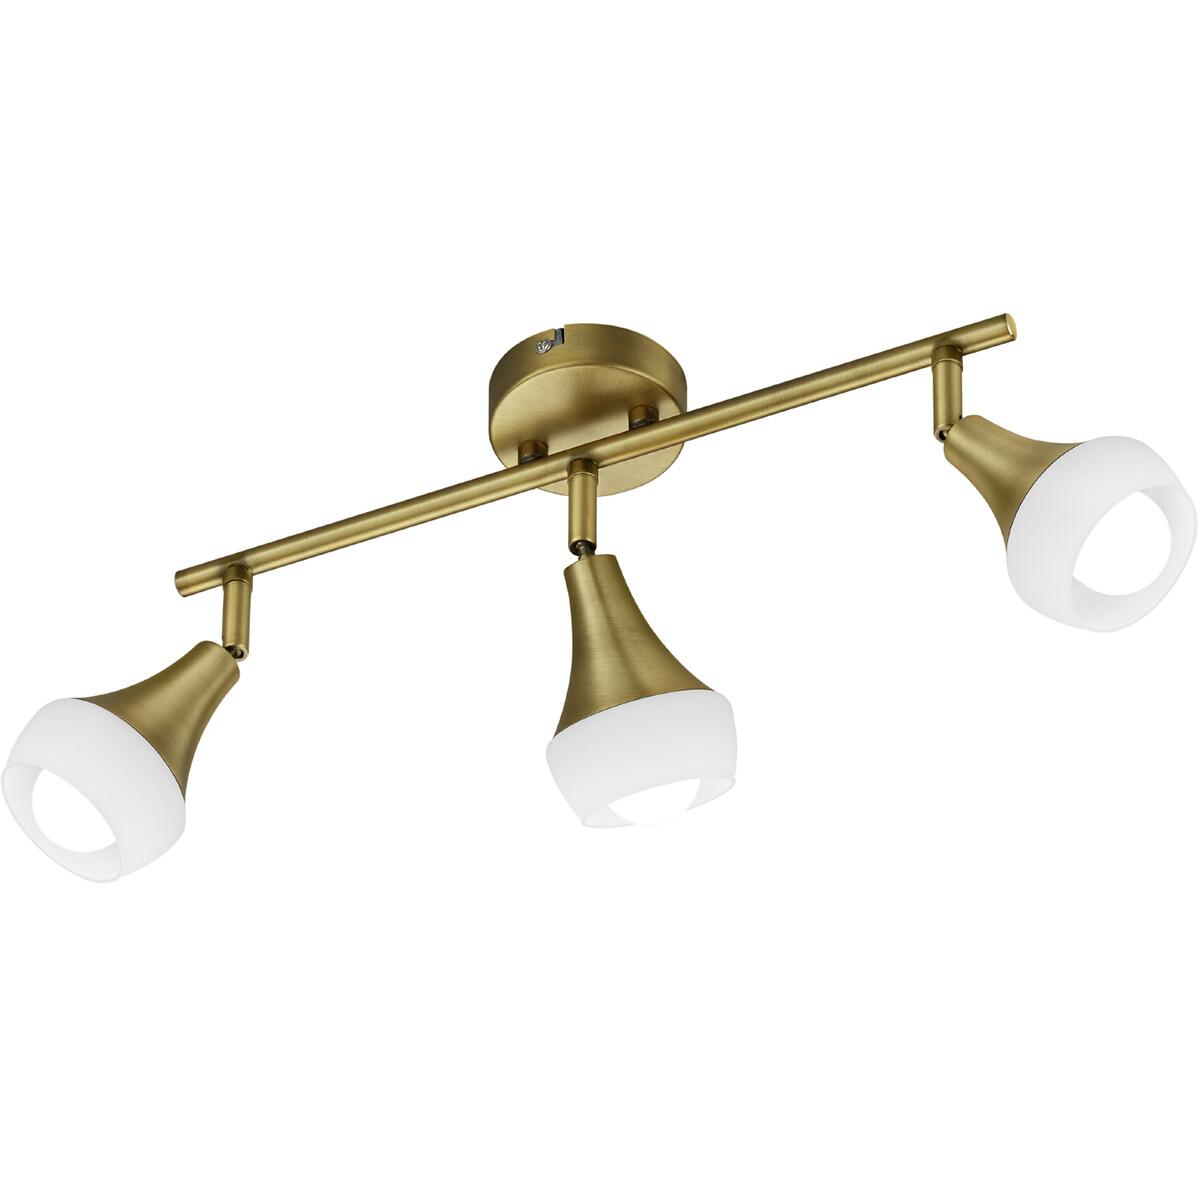 LED Plafondspot - Trion Trompo - E14 Fitting - 3-lichts - Rechthoek - Oud Brons - Aluminium